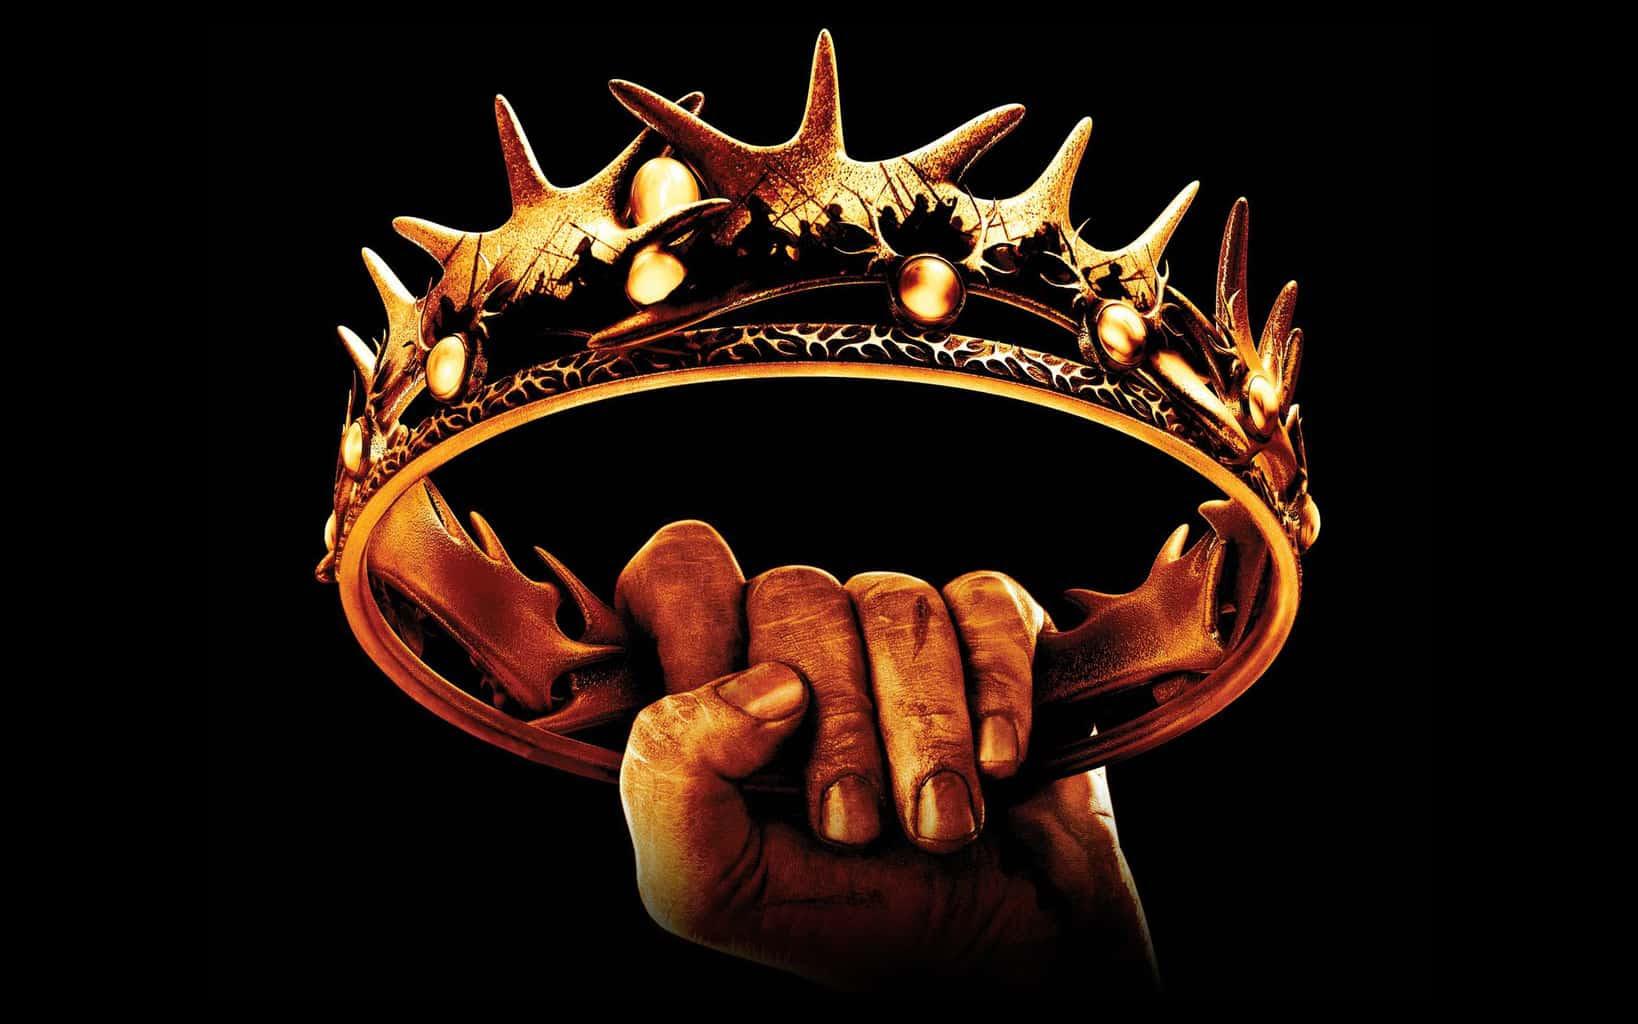 Znalezione obrazy dla zapytania game of thrones season 2